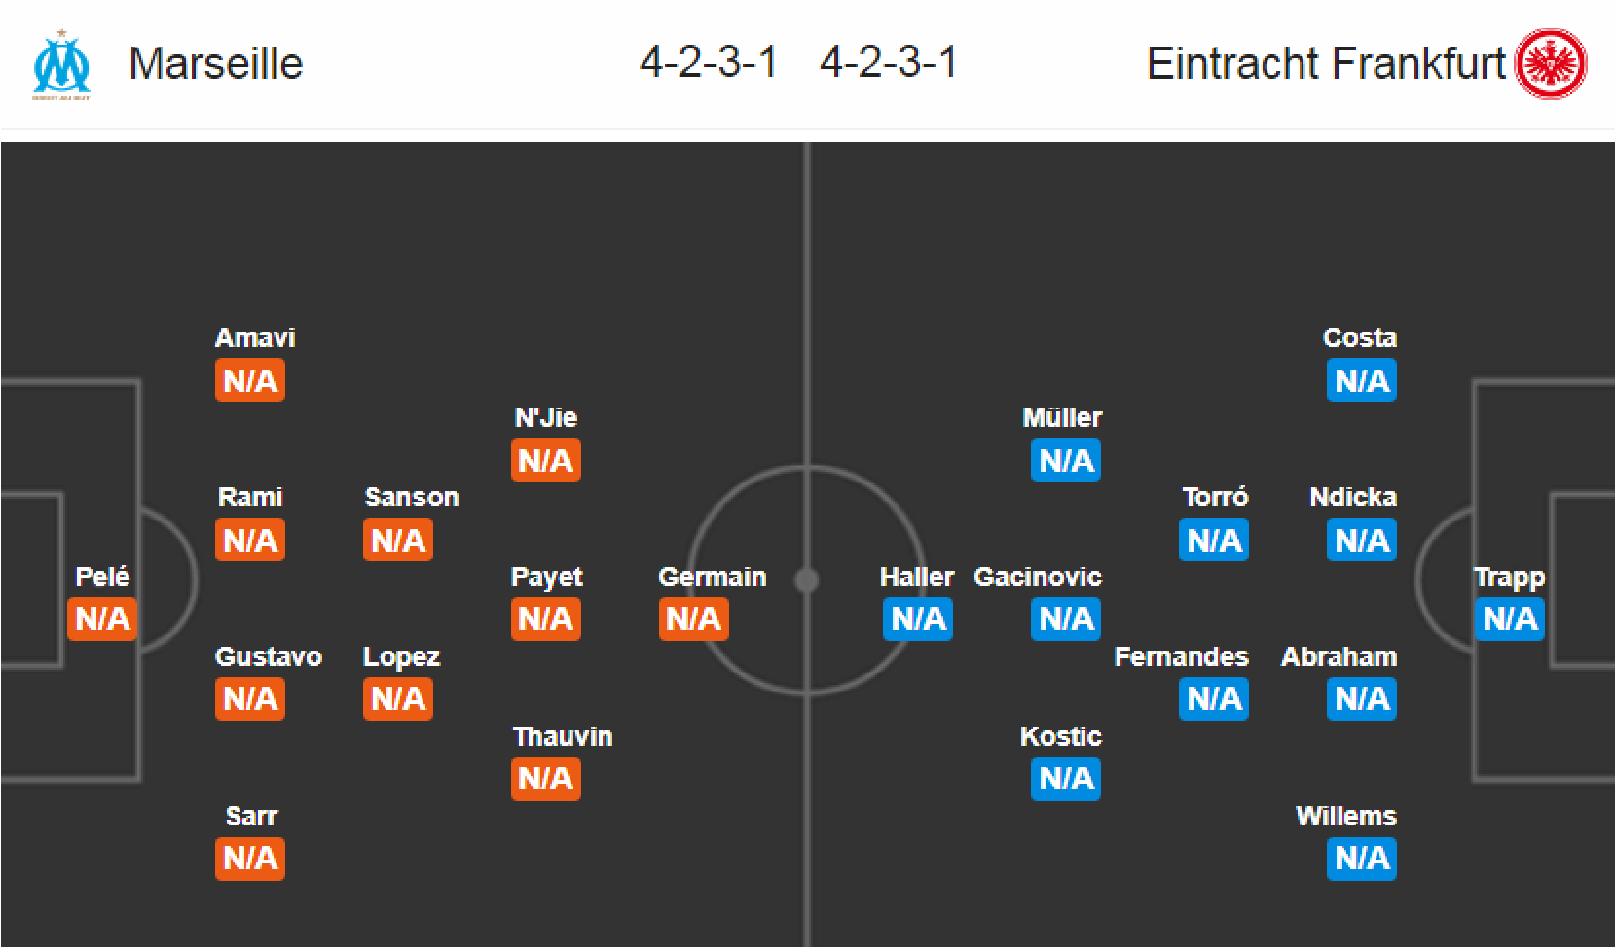 Marseille - Eintracht Frankfurt